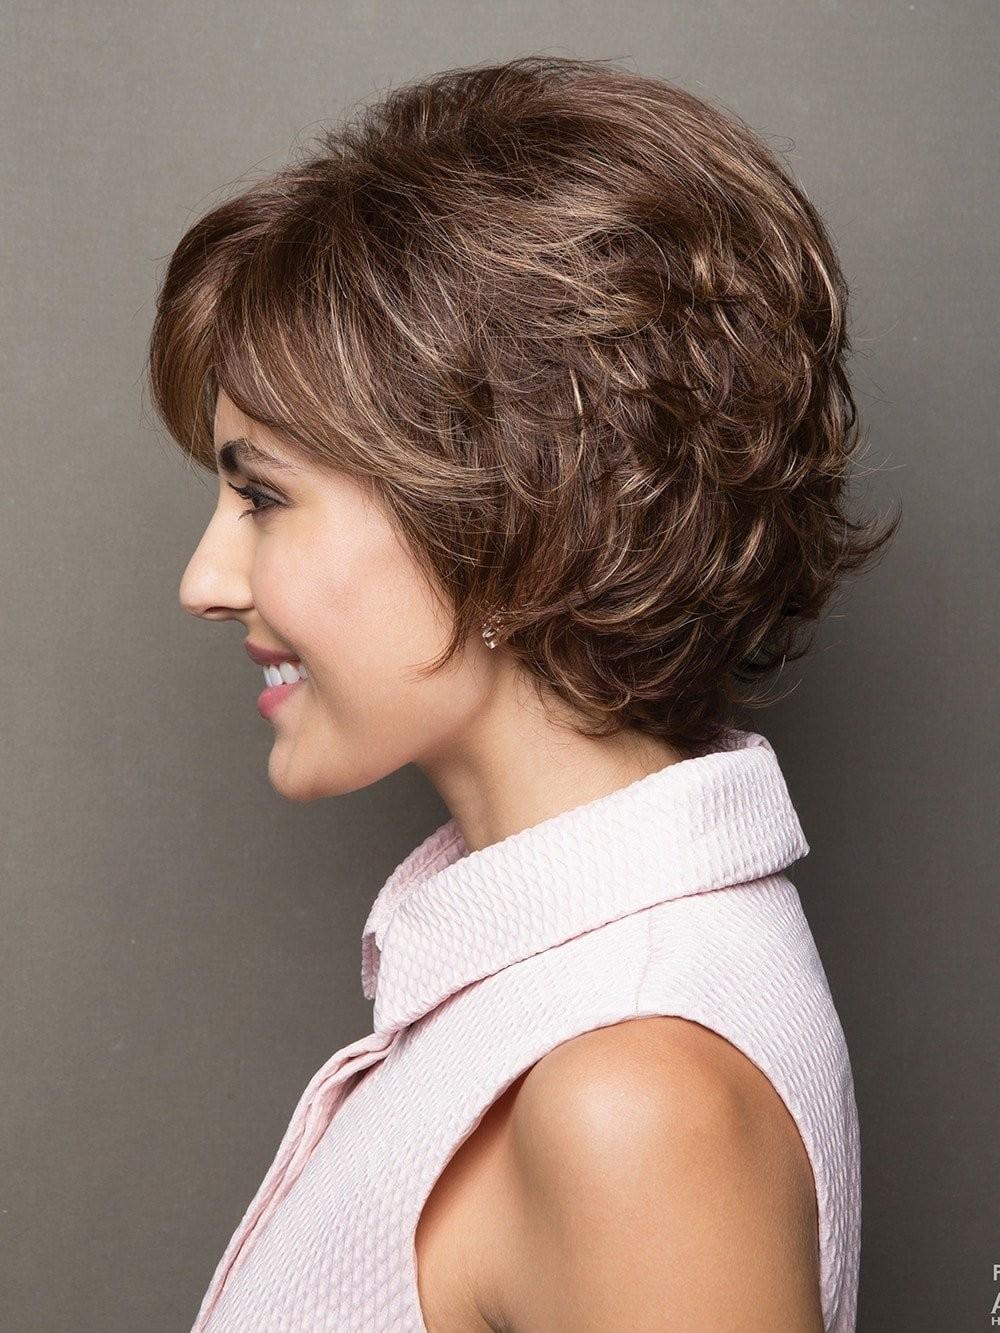 Fashion Synthetic Short Brown Wavy Hair Wigs, Best Wigs Online Sale - Rewigs.com